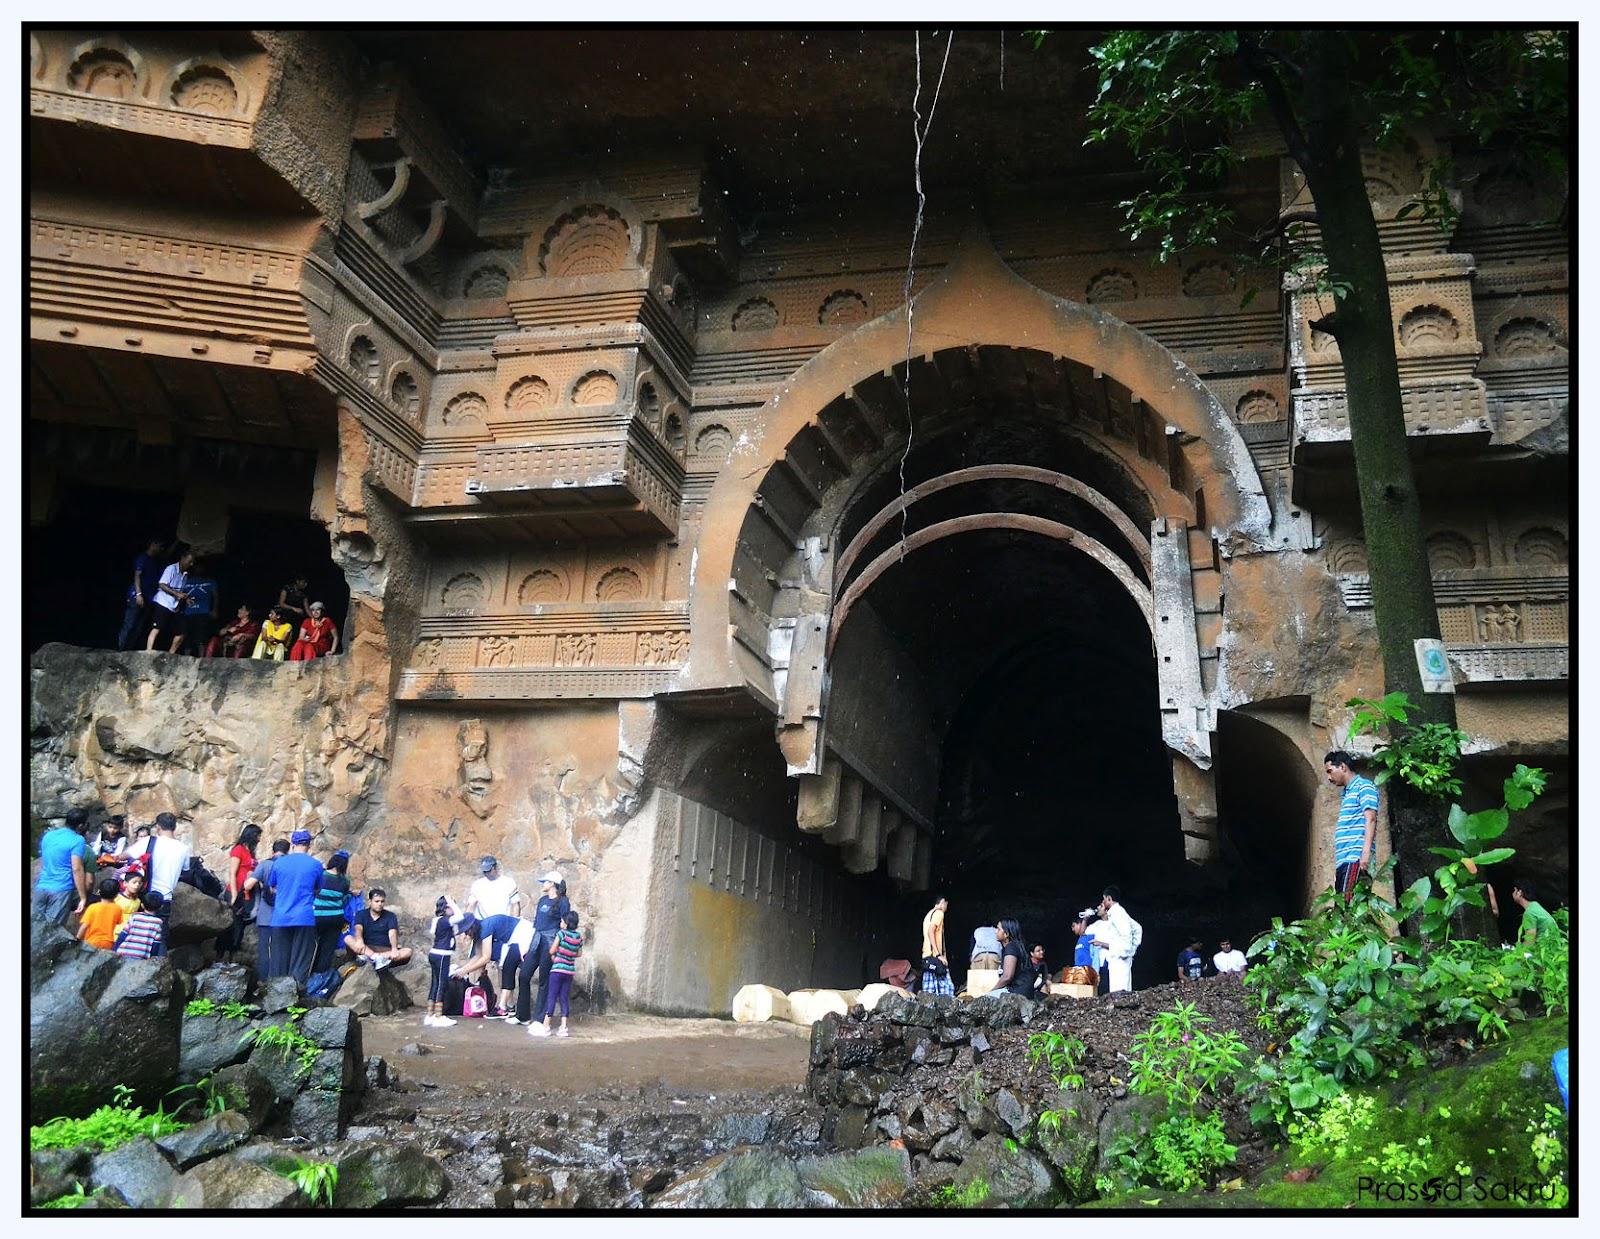 Karjat India  city photo : ... to Kondana Caves , Karjat on 8th September 2012 | Trek Mates India